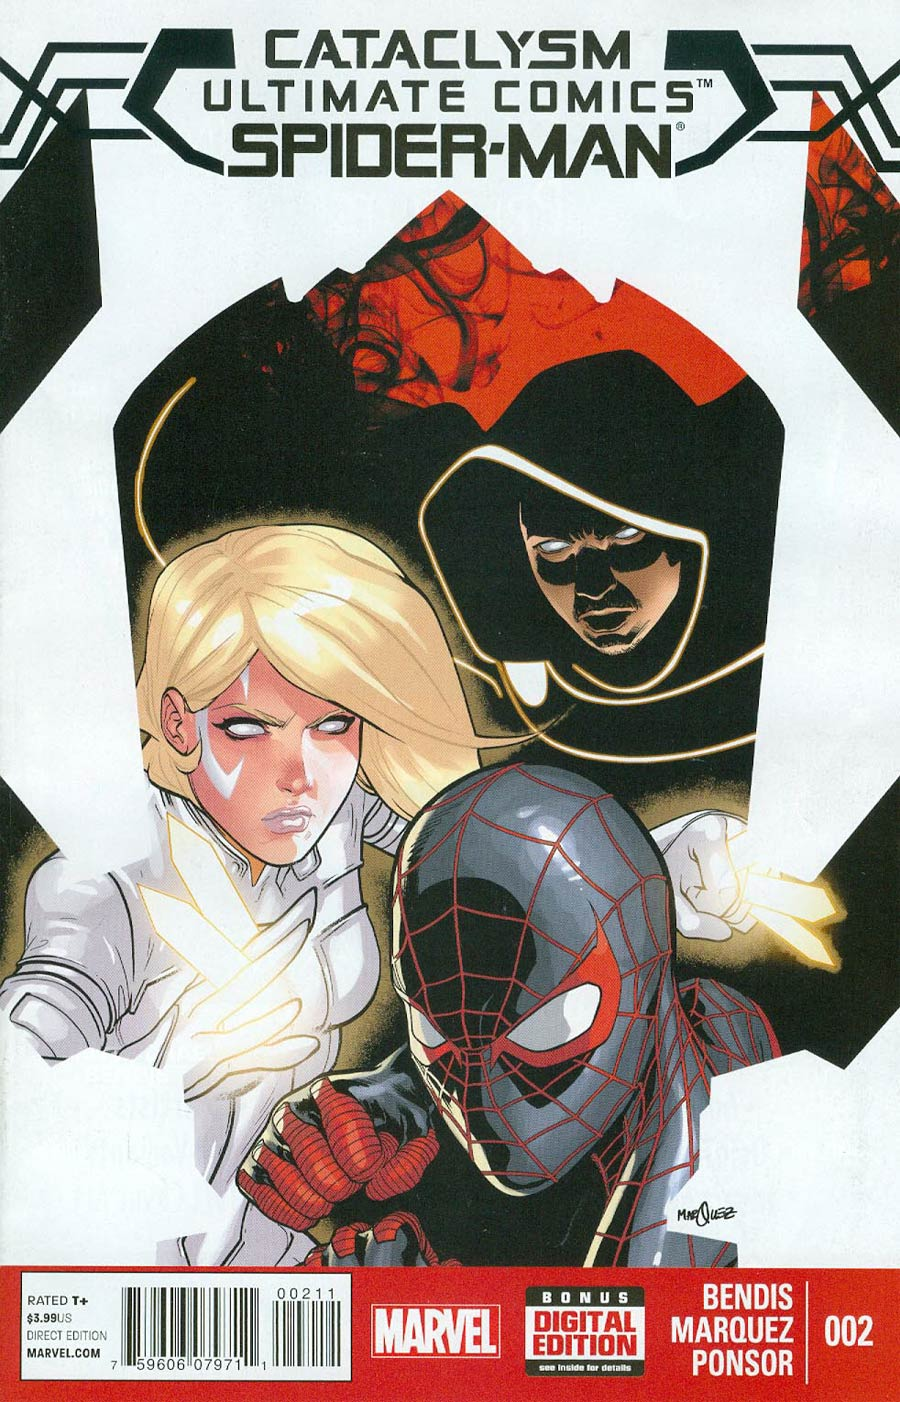 Cataclysm Ultimate Spider-Man #2